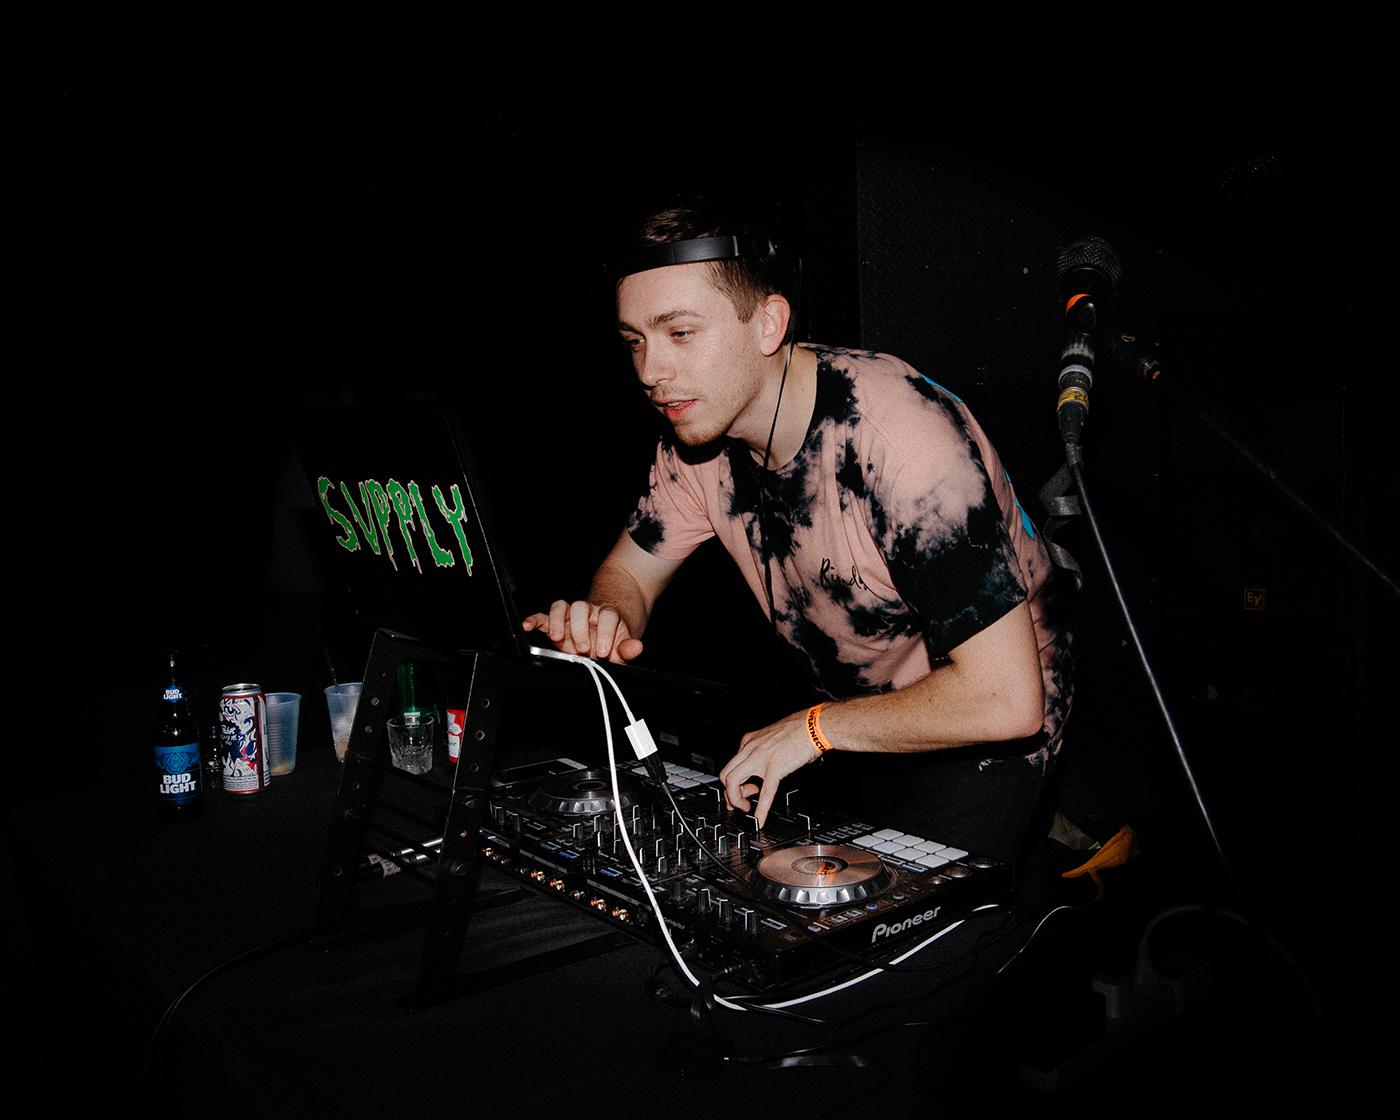 DJ-Svpply-2000s-Hip-Hop-4.jpg